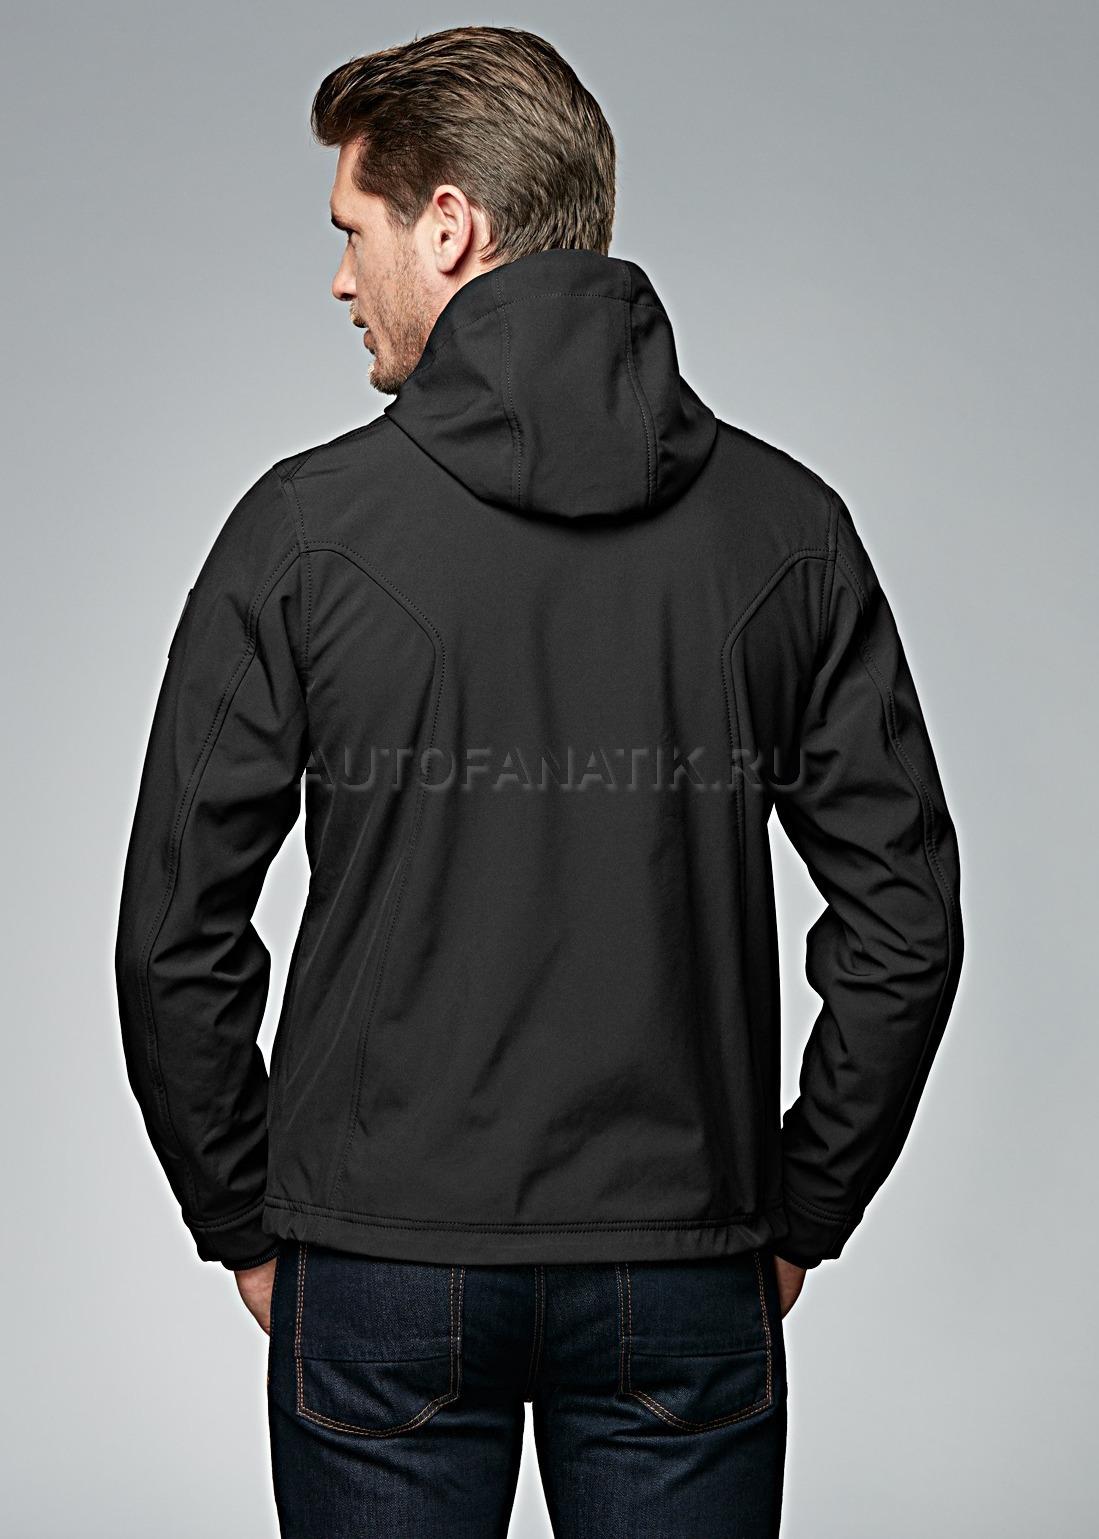 Мужская куртка Porsche Wap51600s0h 21500 руб